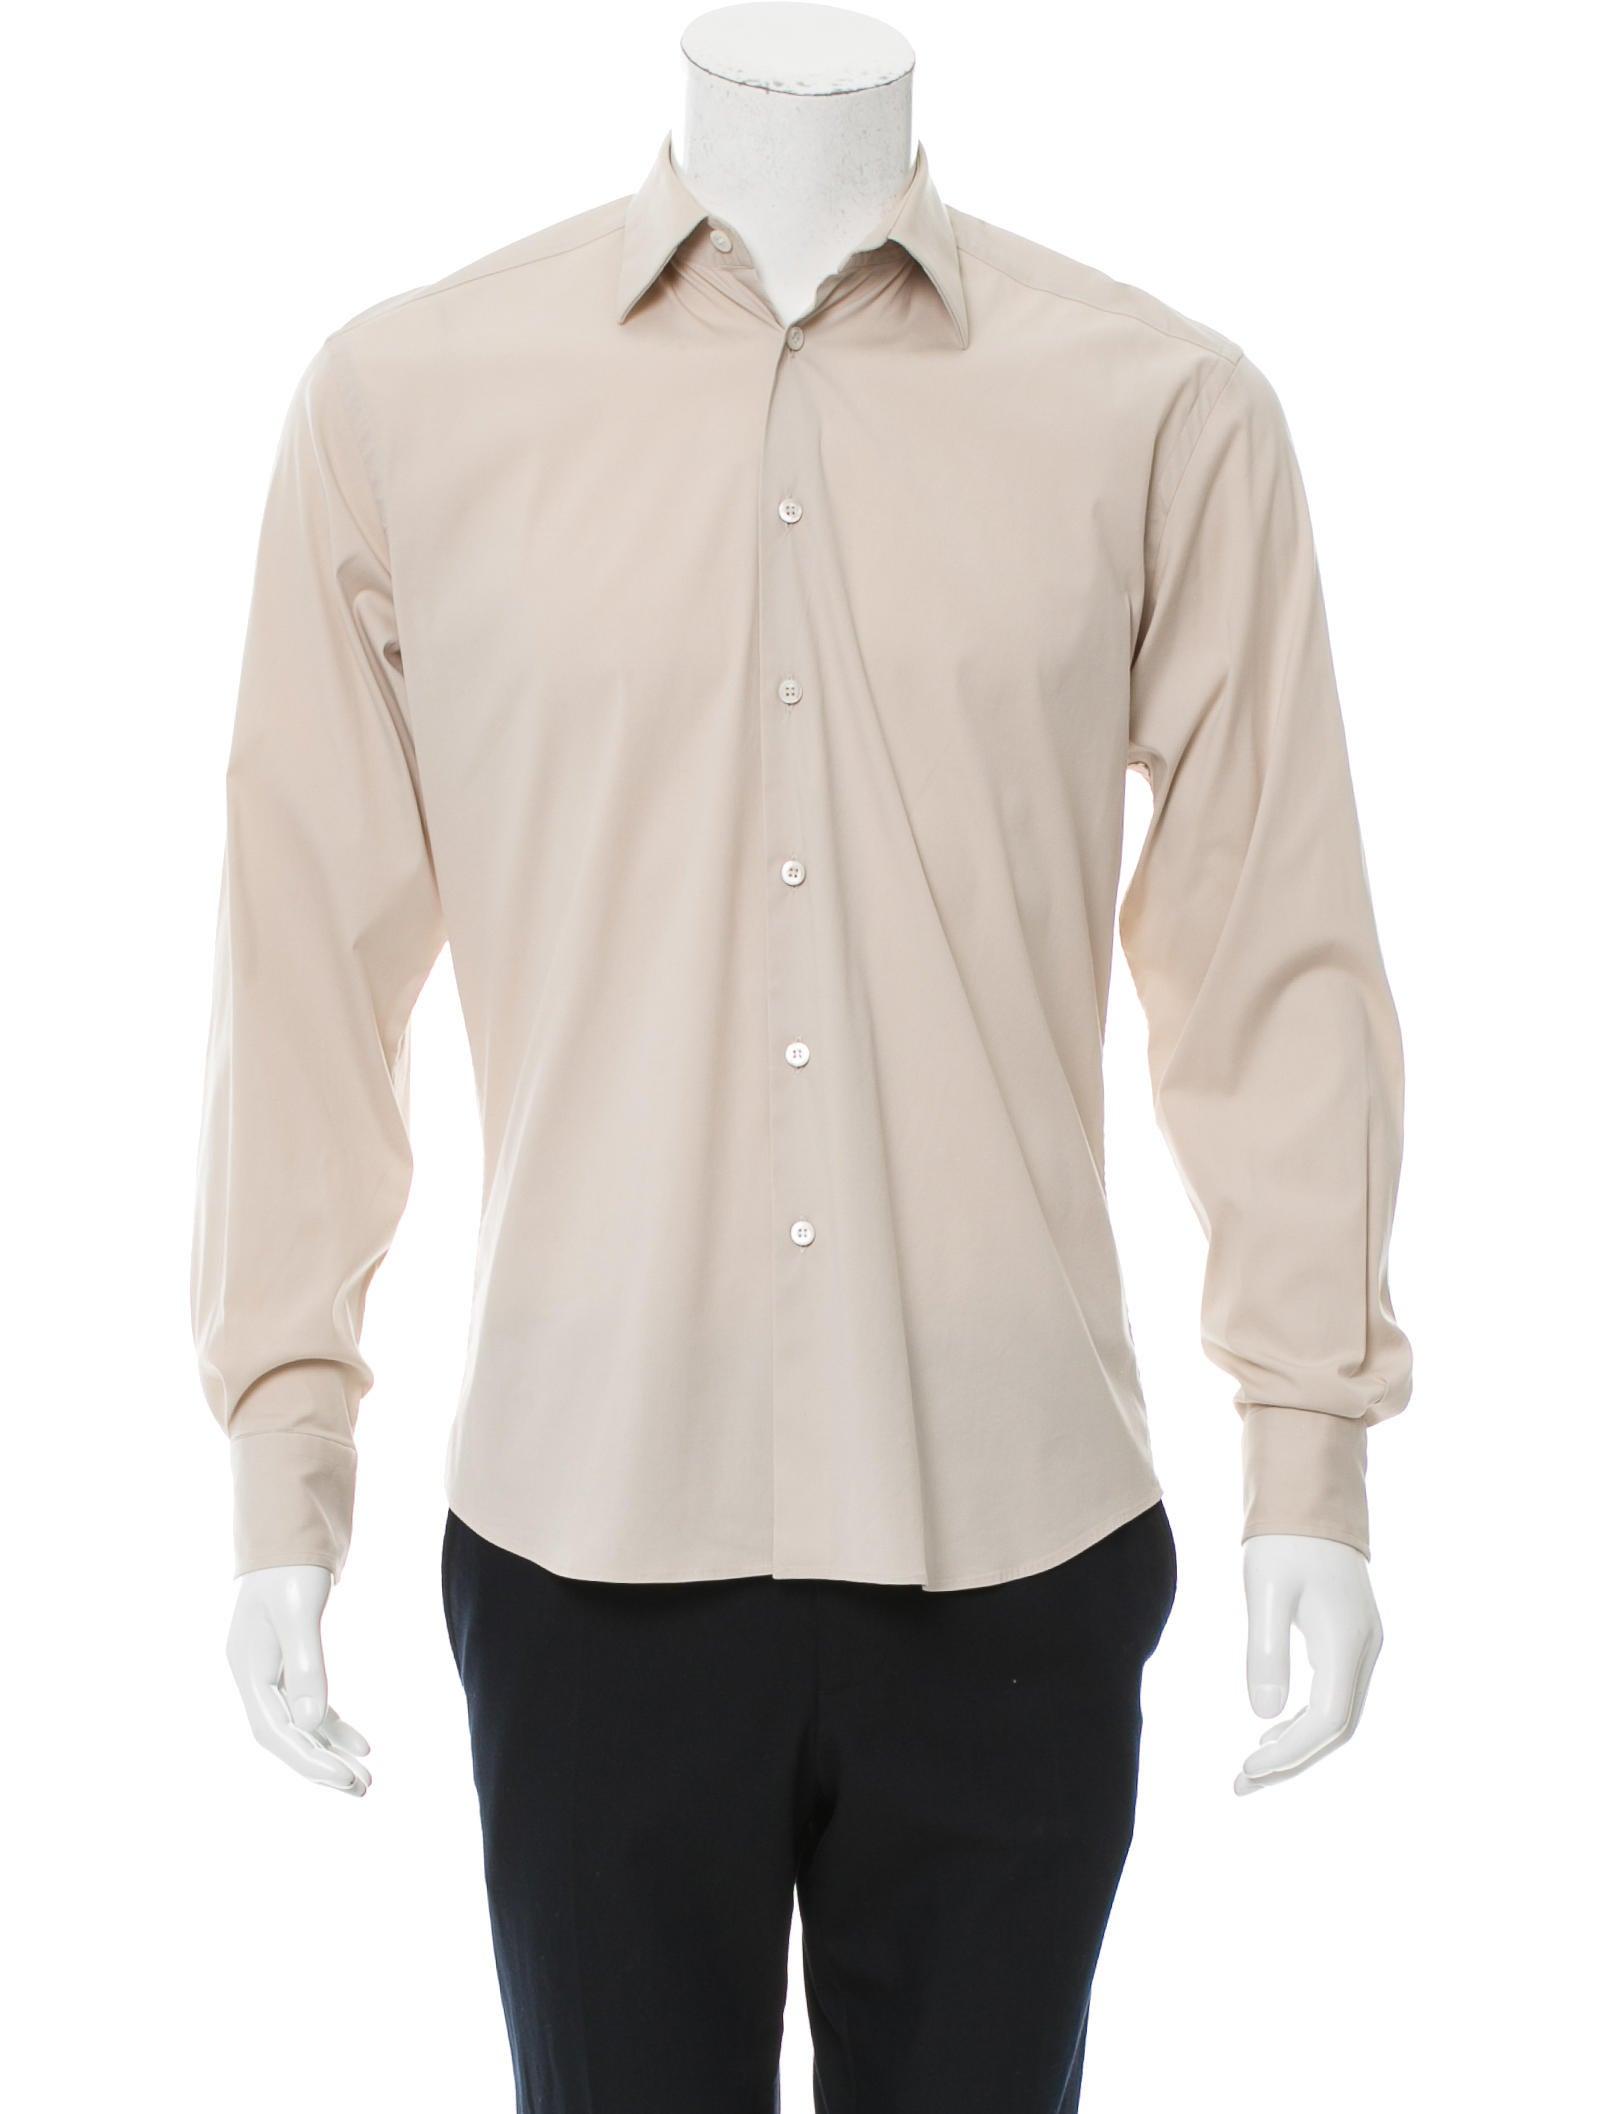 Prada Long Sleeve Button Up Shirt Clothing Pra147301